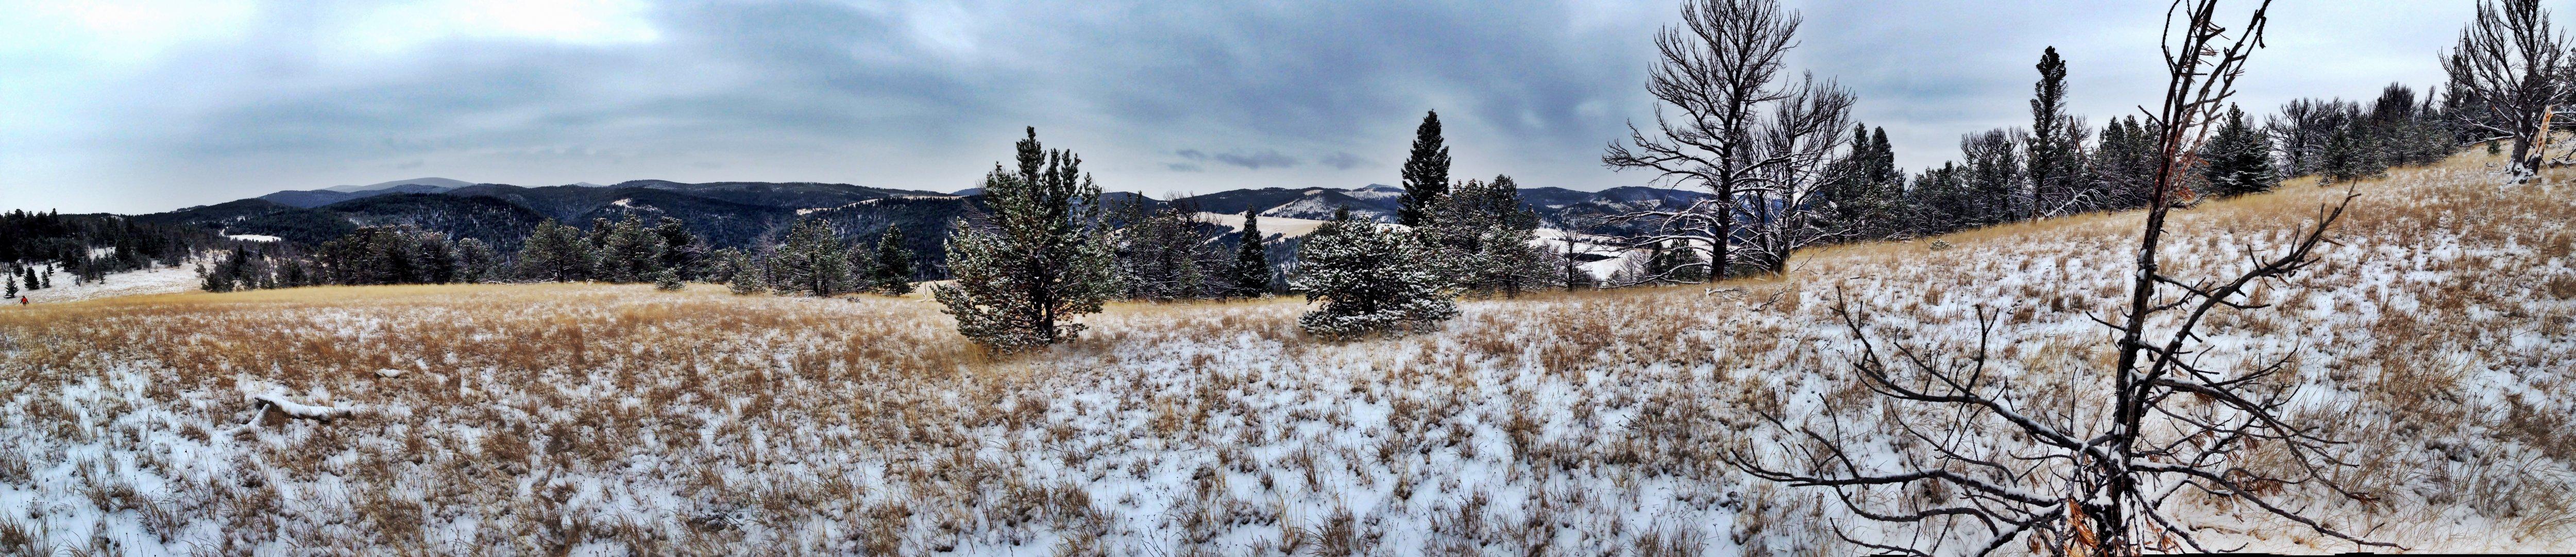 Helena National Forest, Helena, MT